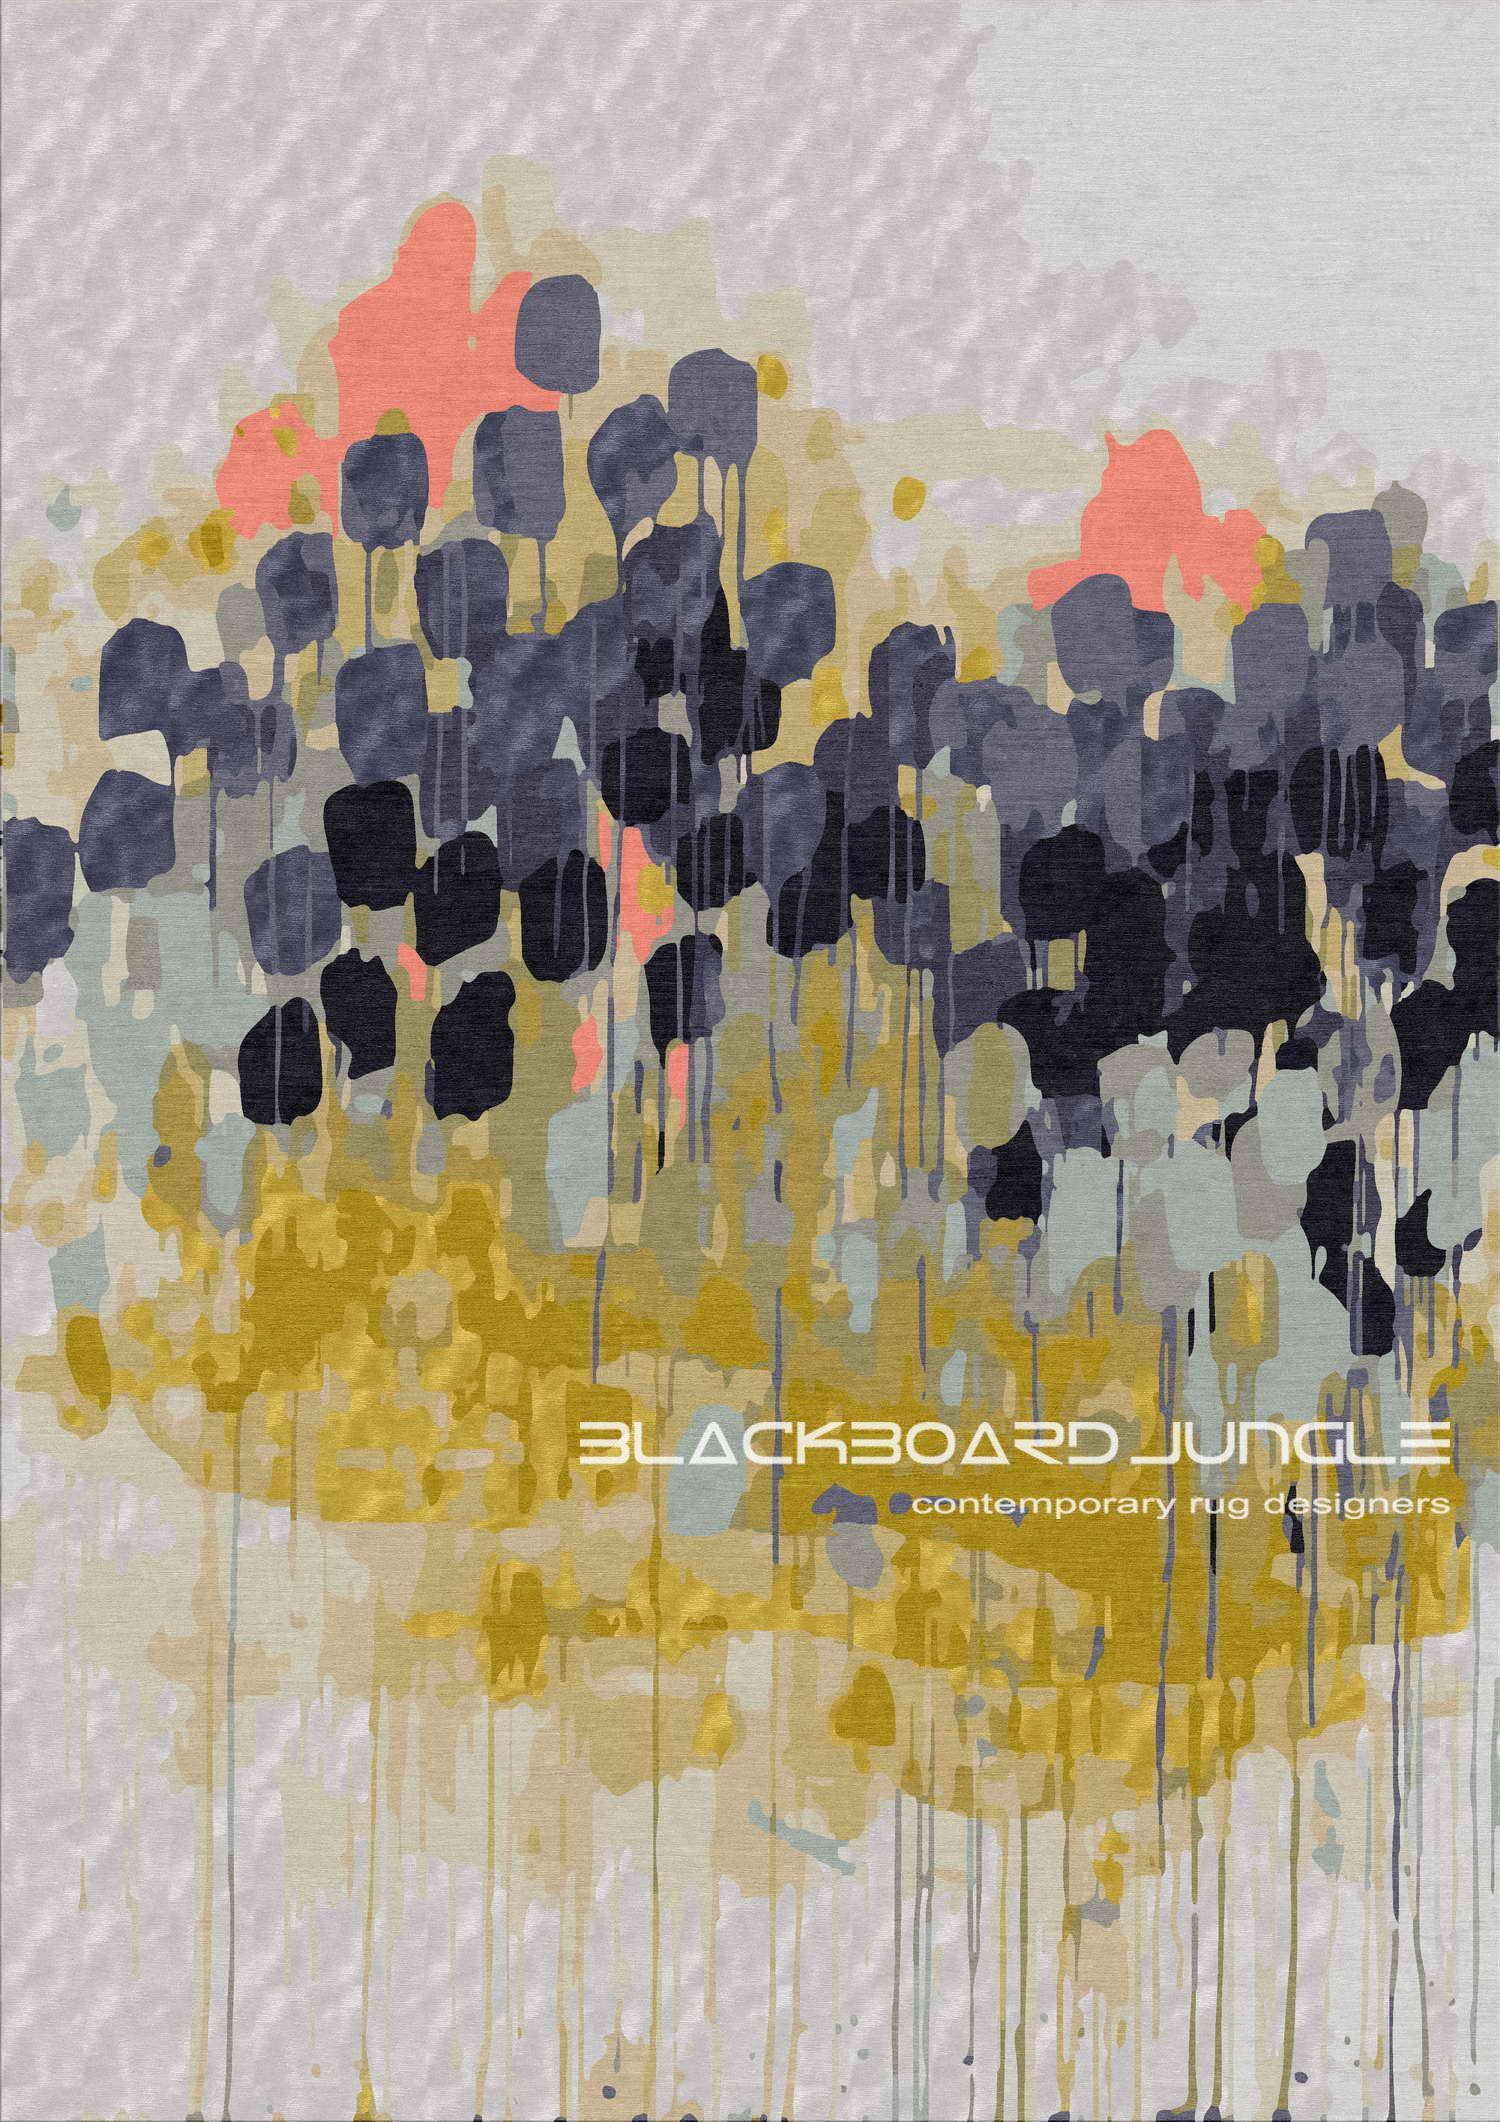 Rug Designs Blackboard Jungle Rugs Made To Order Rugs